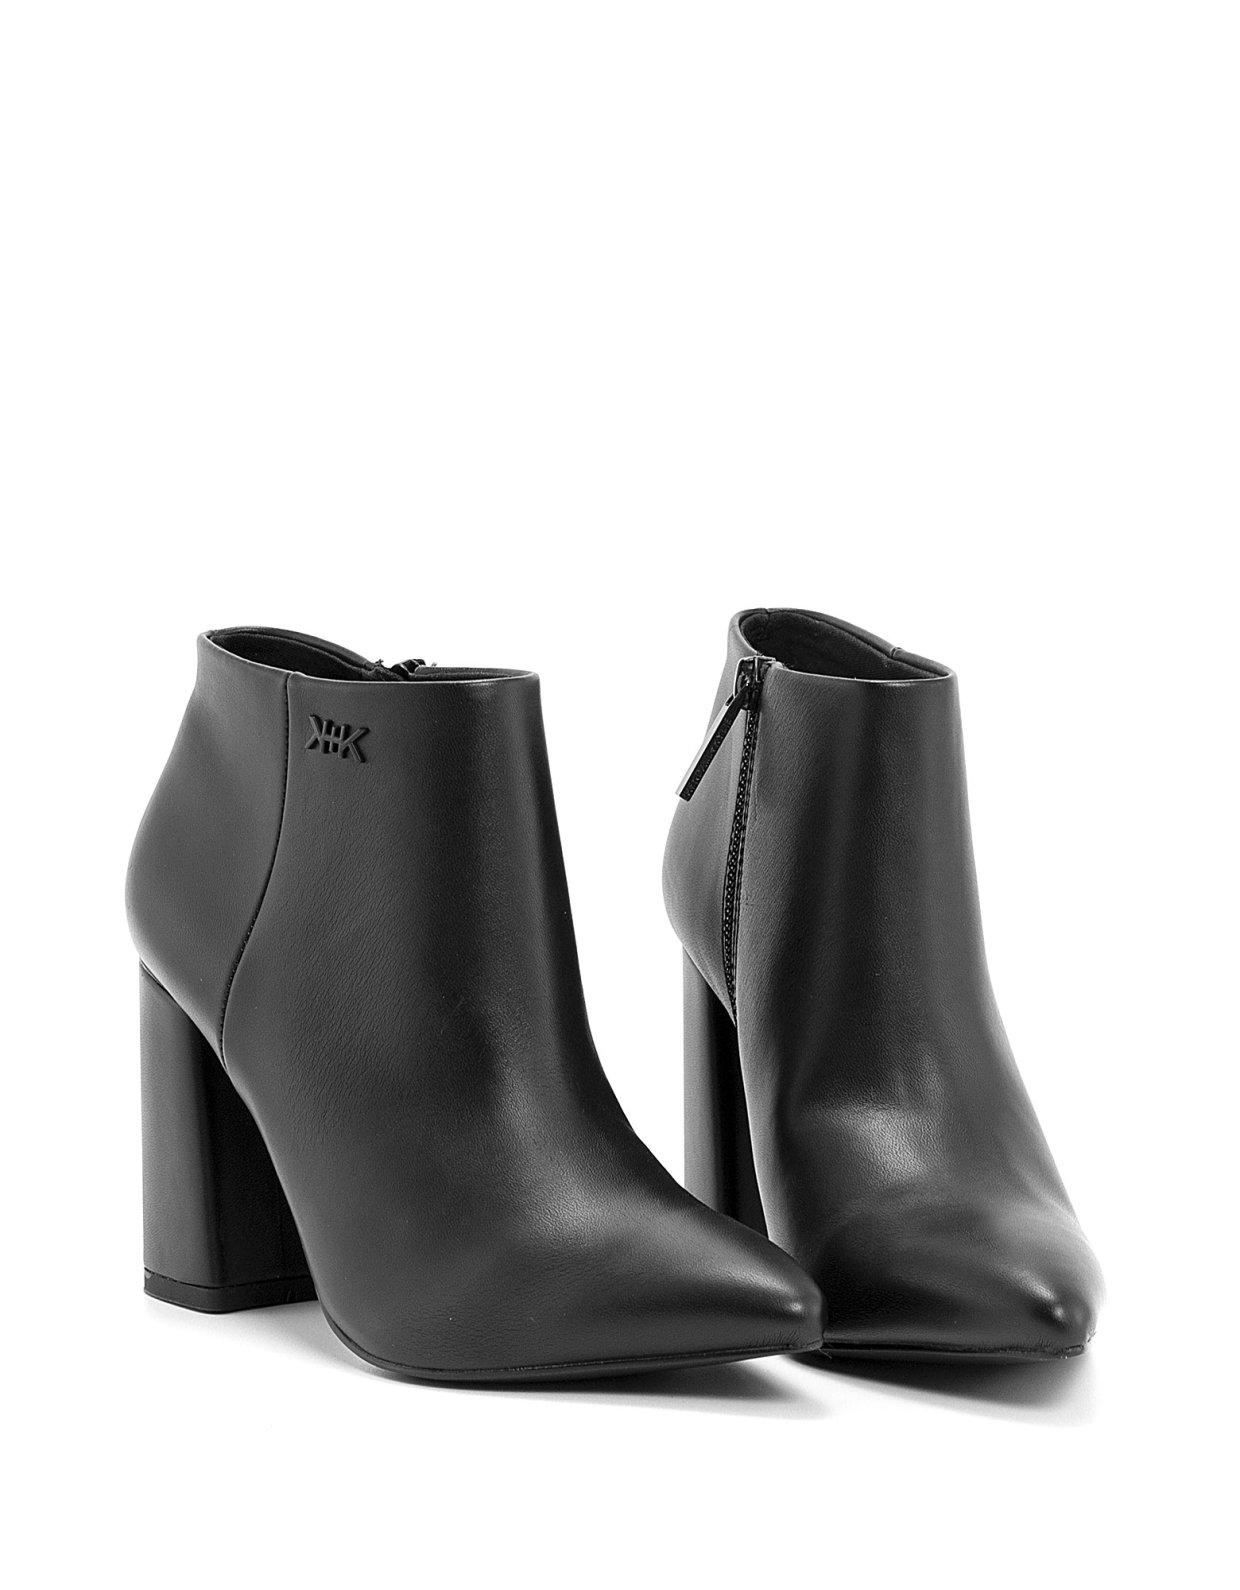 Kendall + Kylie Zain shoes black